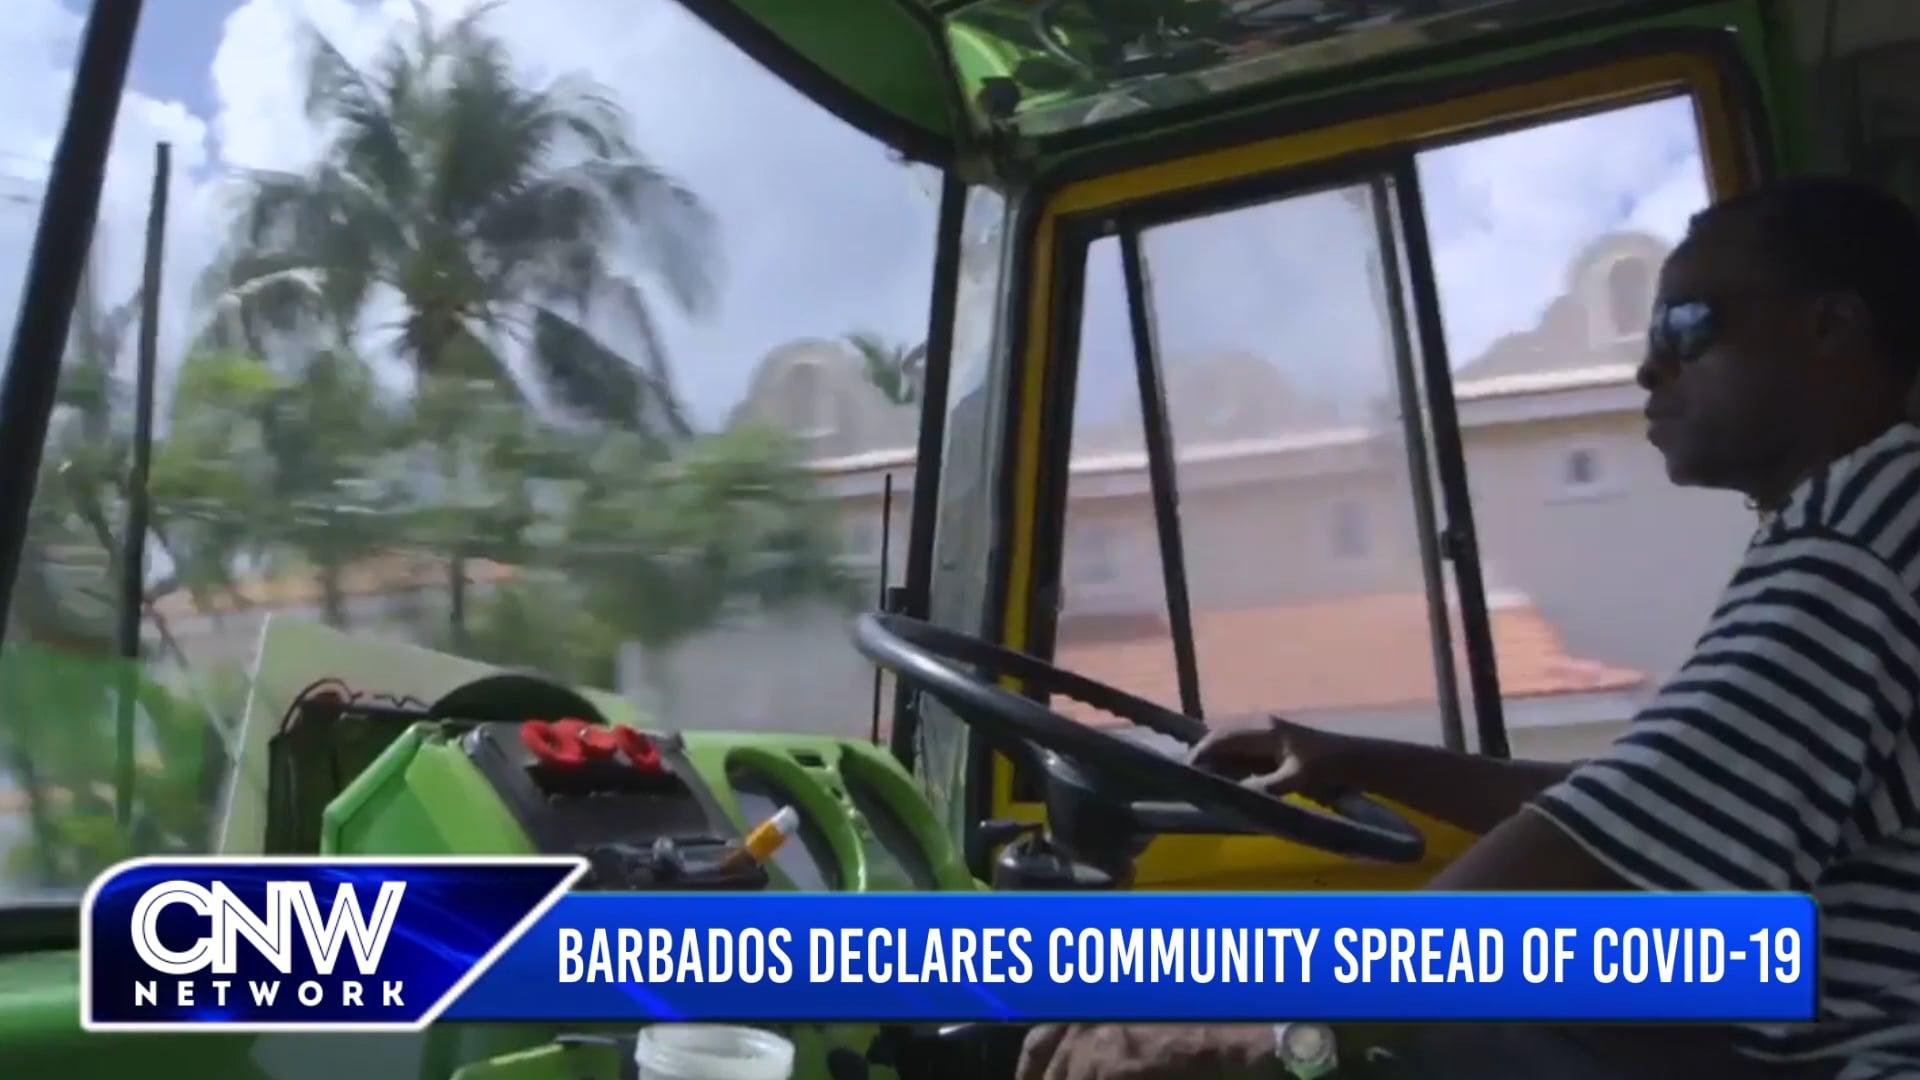 CNW90 January 25, 2021: Barbados Declares Community Spread of COVID-19